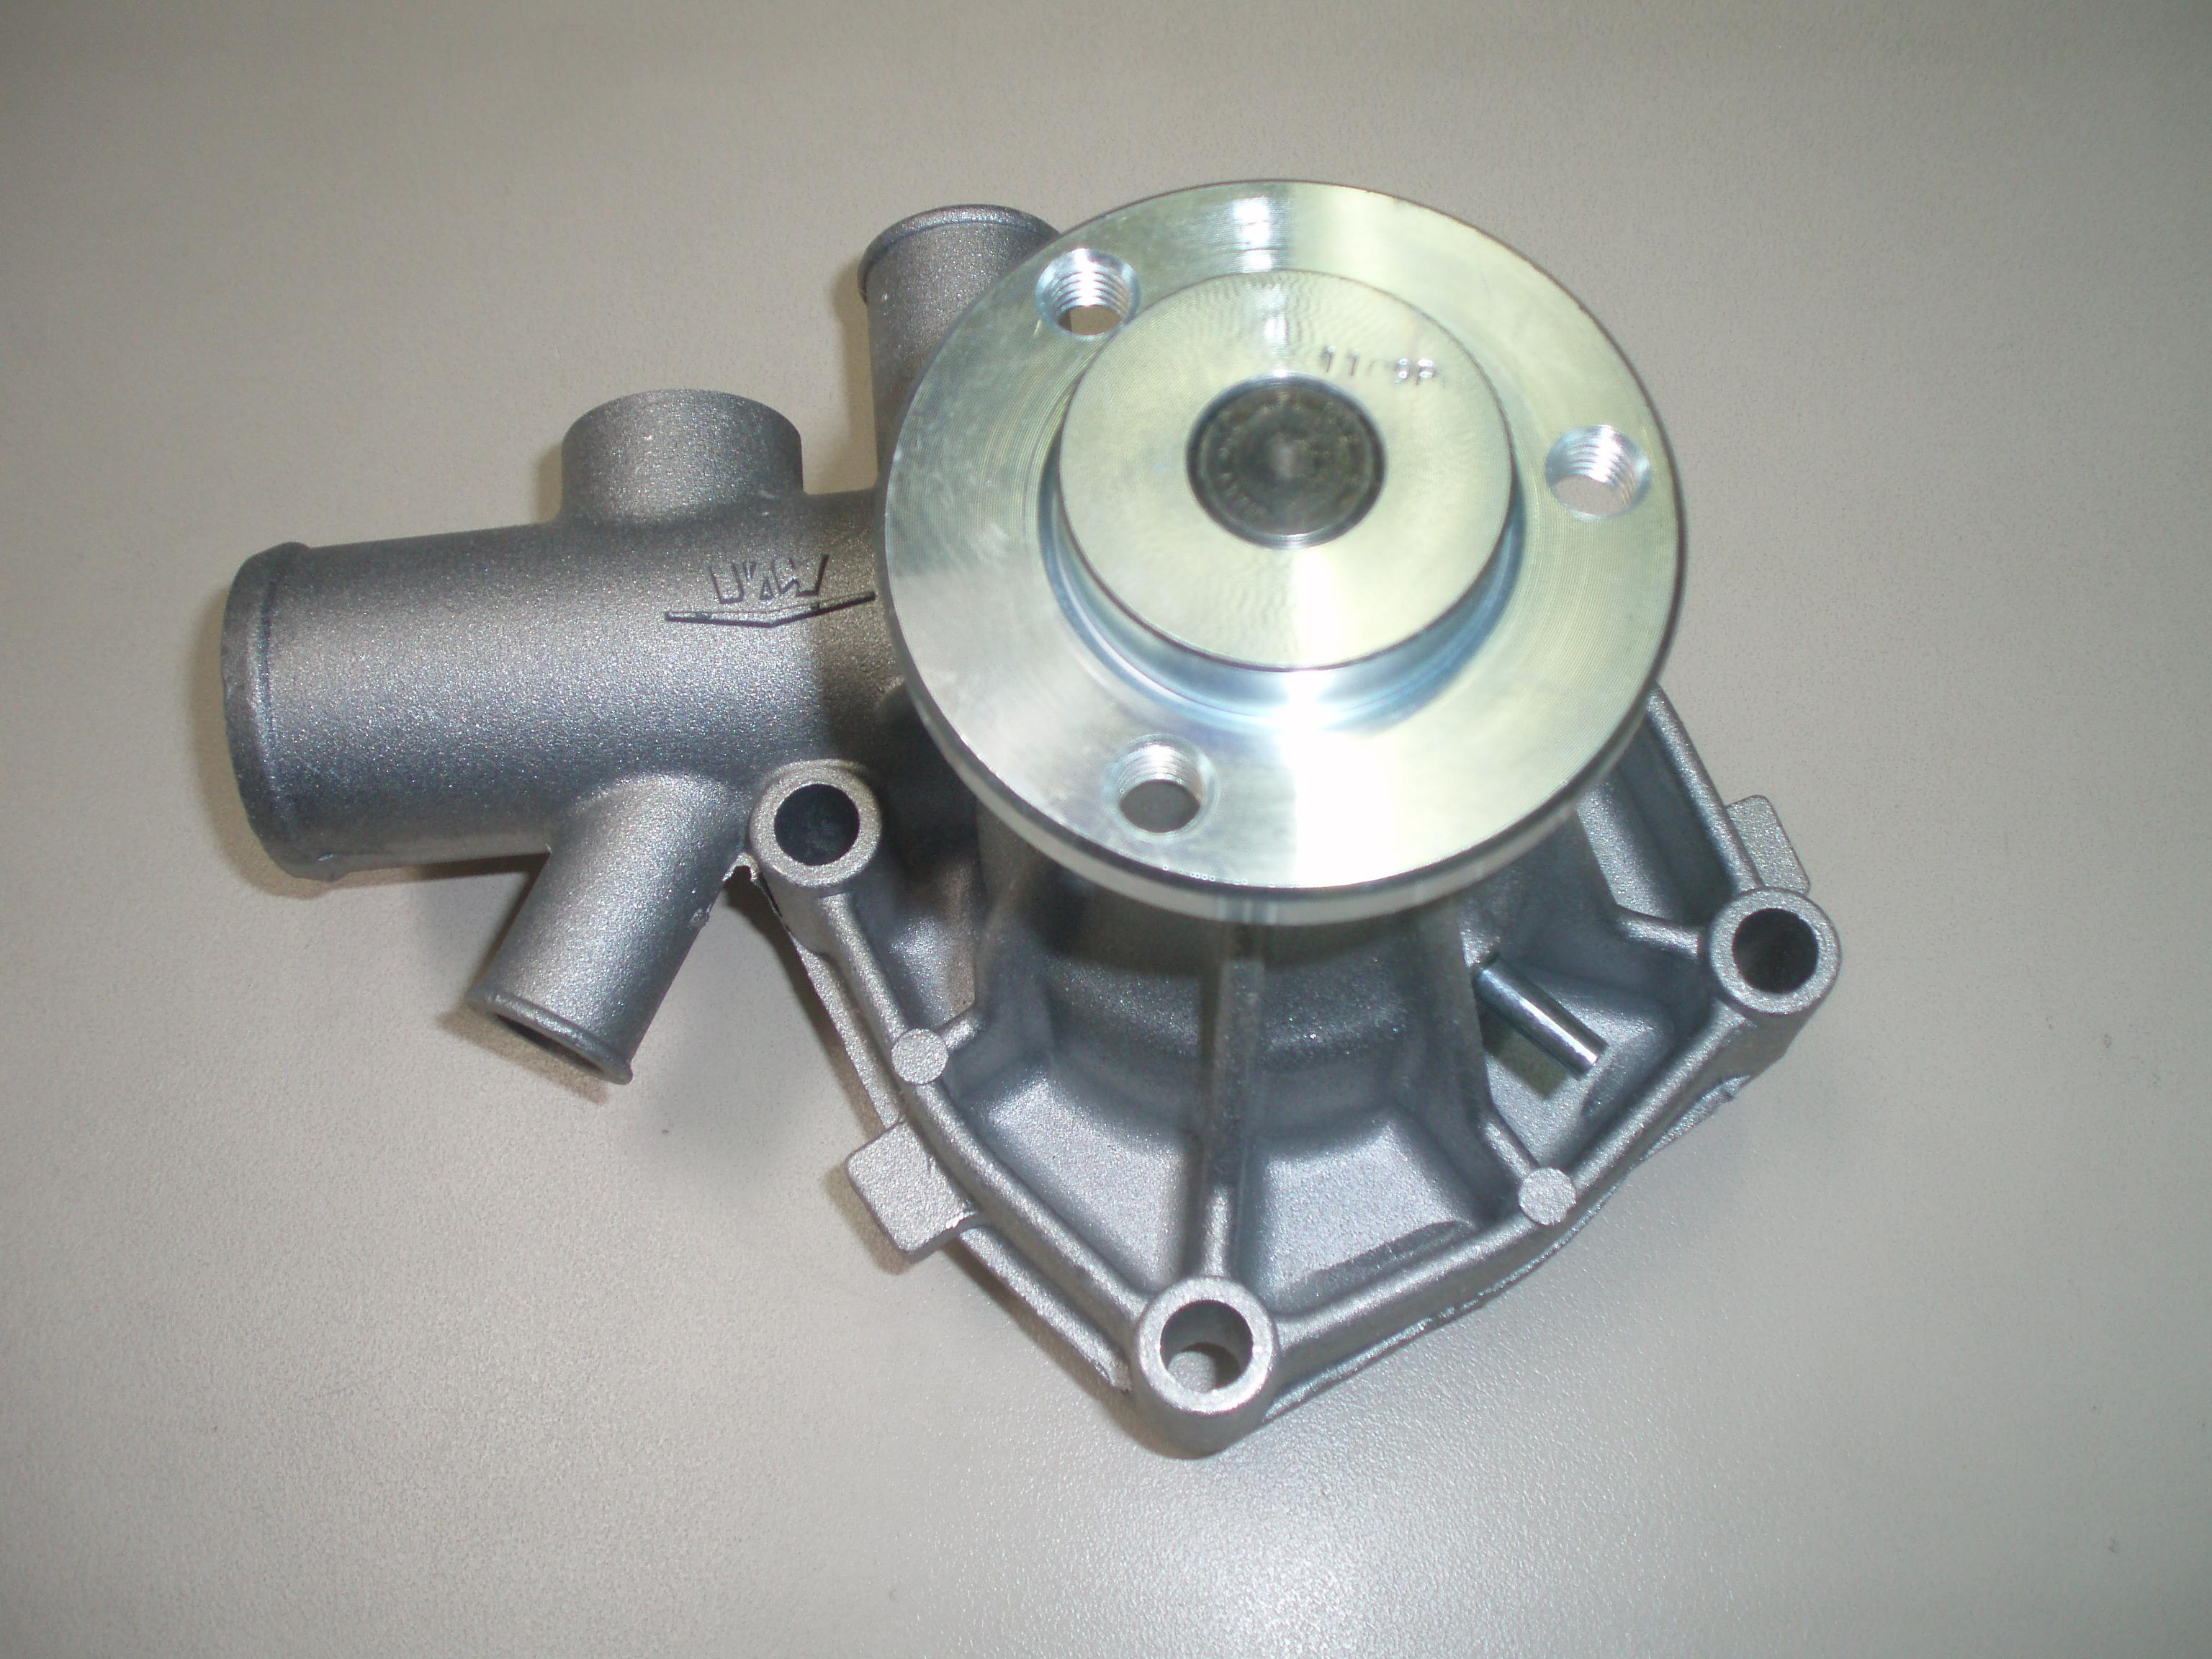 Pompe eau VM15202009 VM92A/3 VM92A/3-04243 HR484HP HR394HPT D703LT (version GOLDONI et CARRARO ANTONIO - HR494H (Version CARRARO ANTONIO) VM15202009F